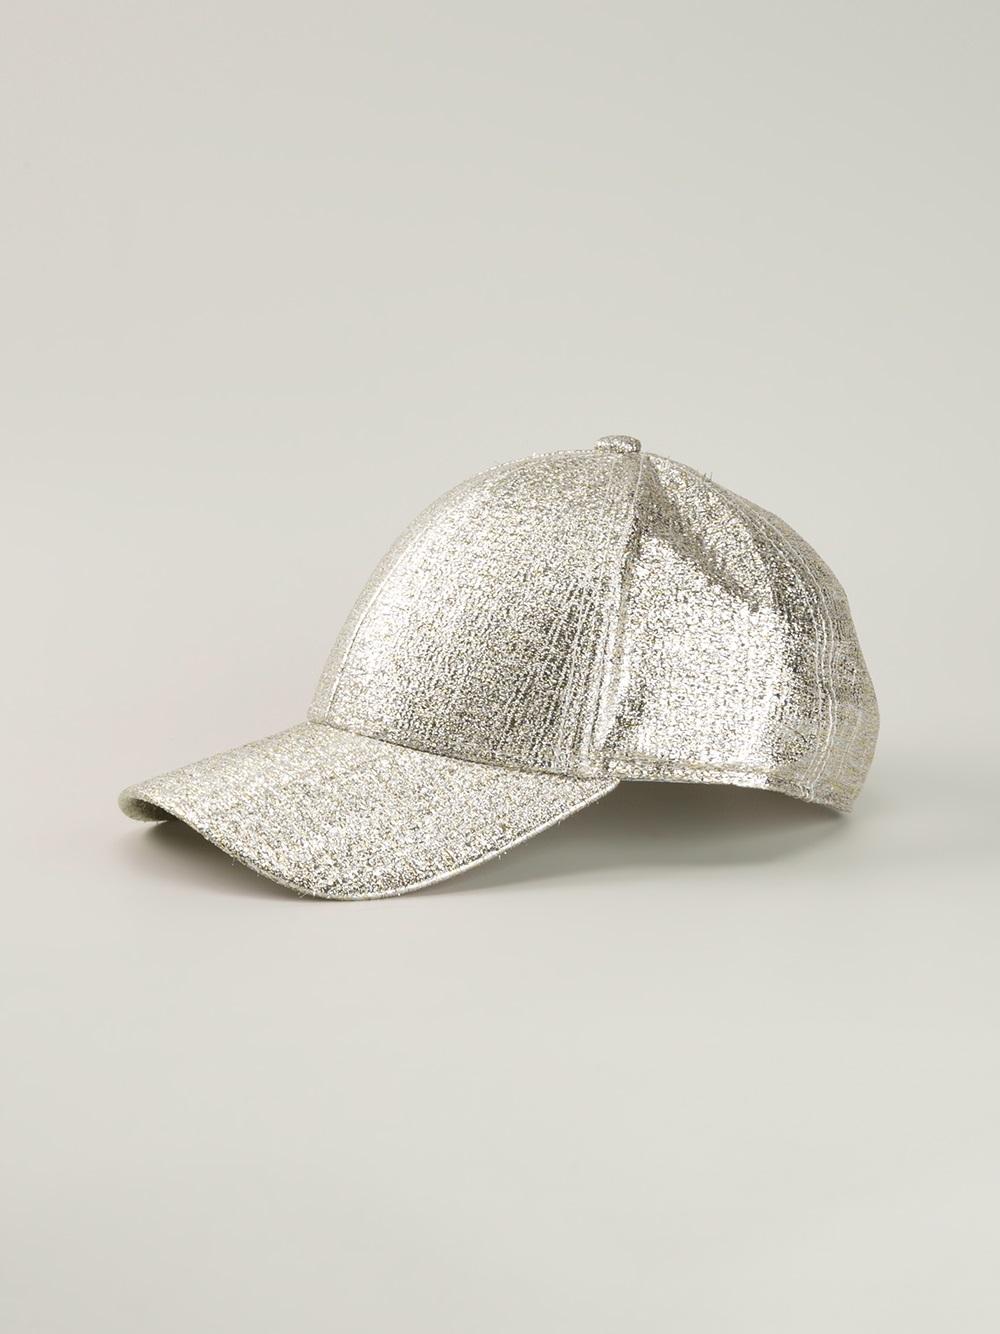 6db6f556815 Lyst - Acne Studios Camp Glitter Cap in Metallic for Men